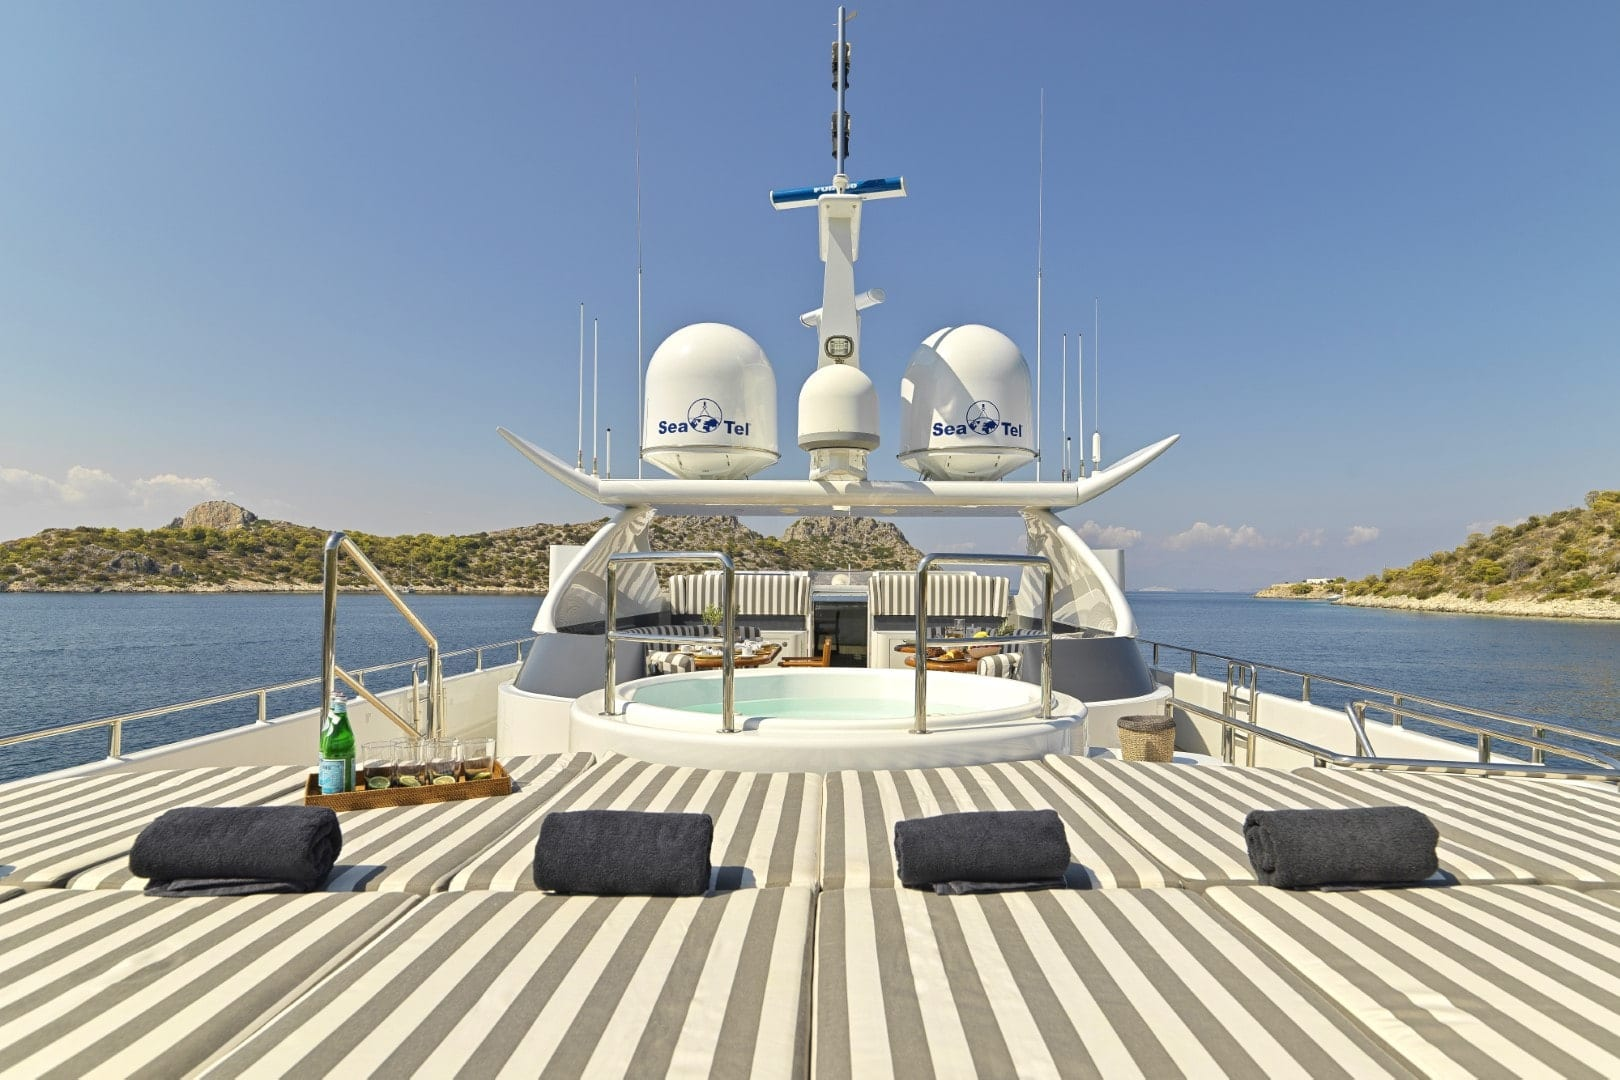 alma-motor-yacht-upper-deck (1)-min